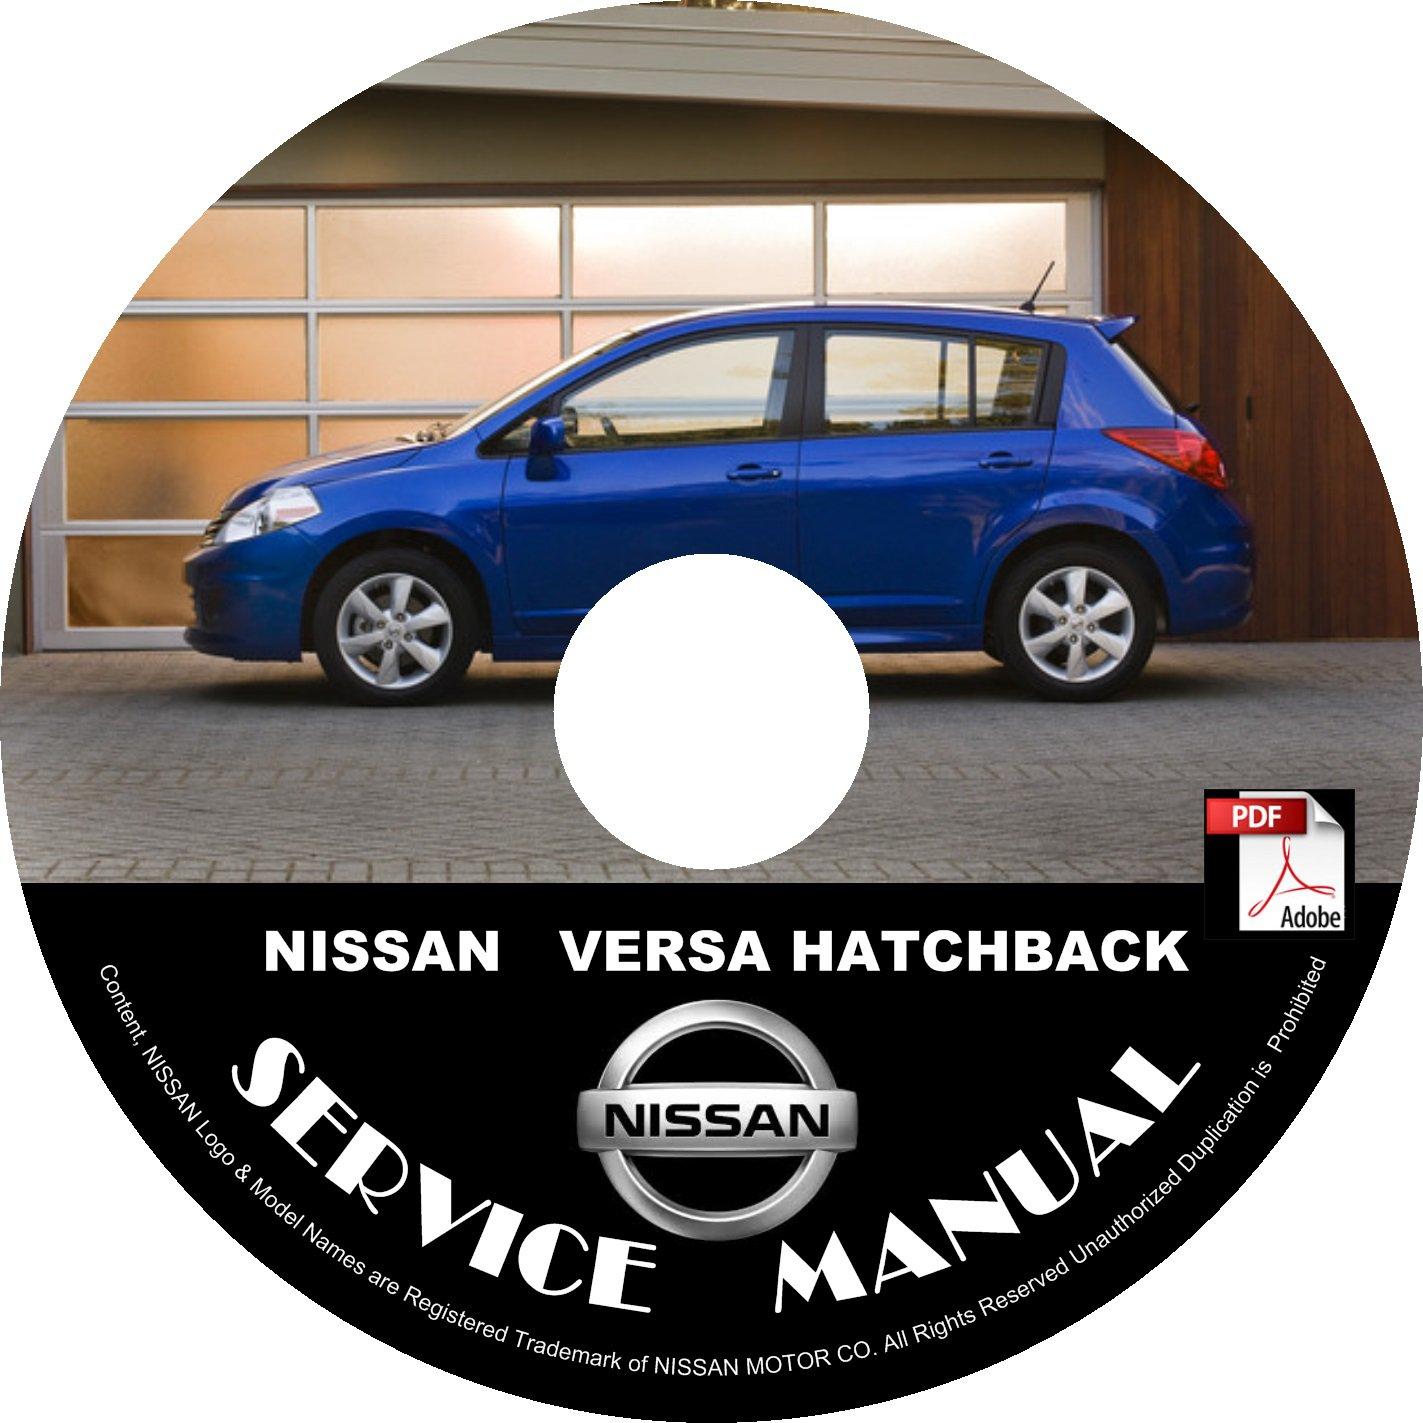 2012 Nissan Versa Hatchback Service Repair Shop Manual on CD